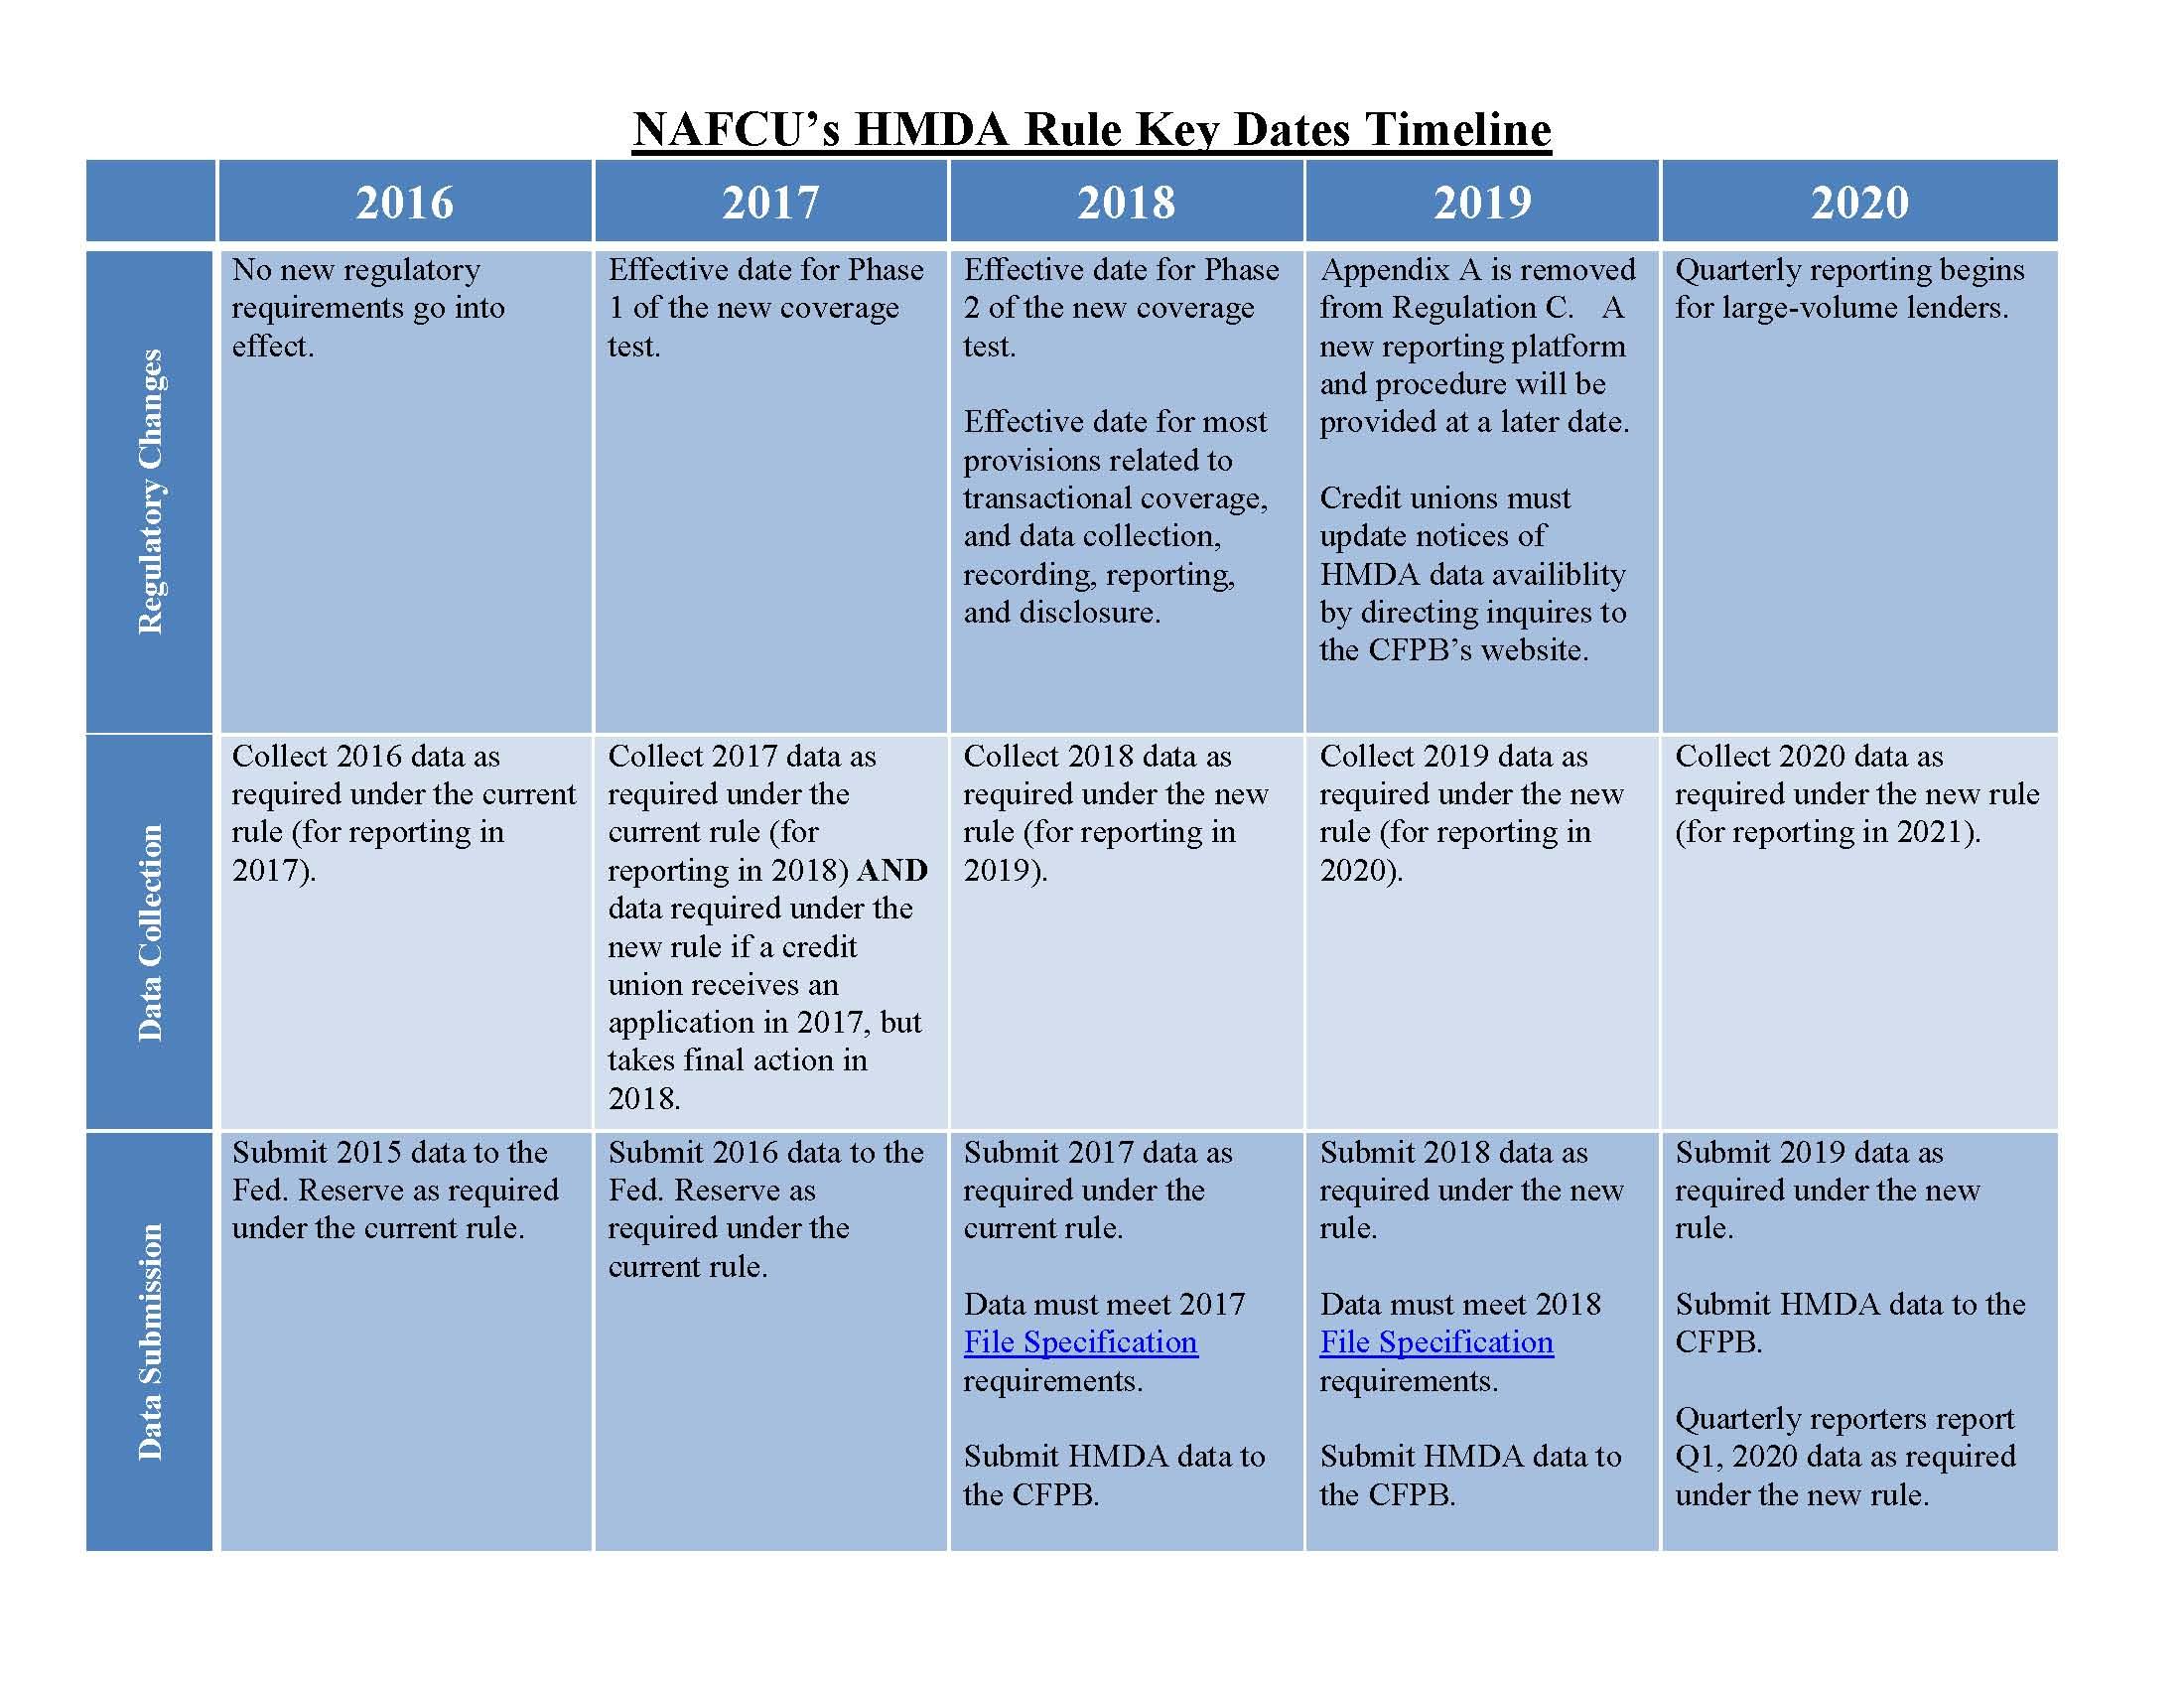 NAFCU Compliance Blog: HMDA/Regulation C